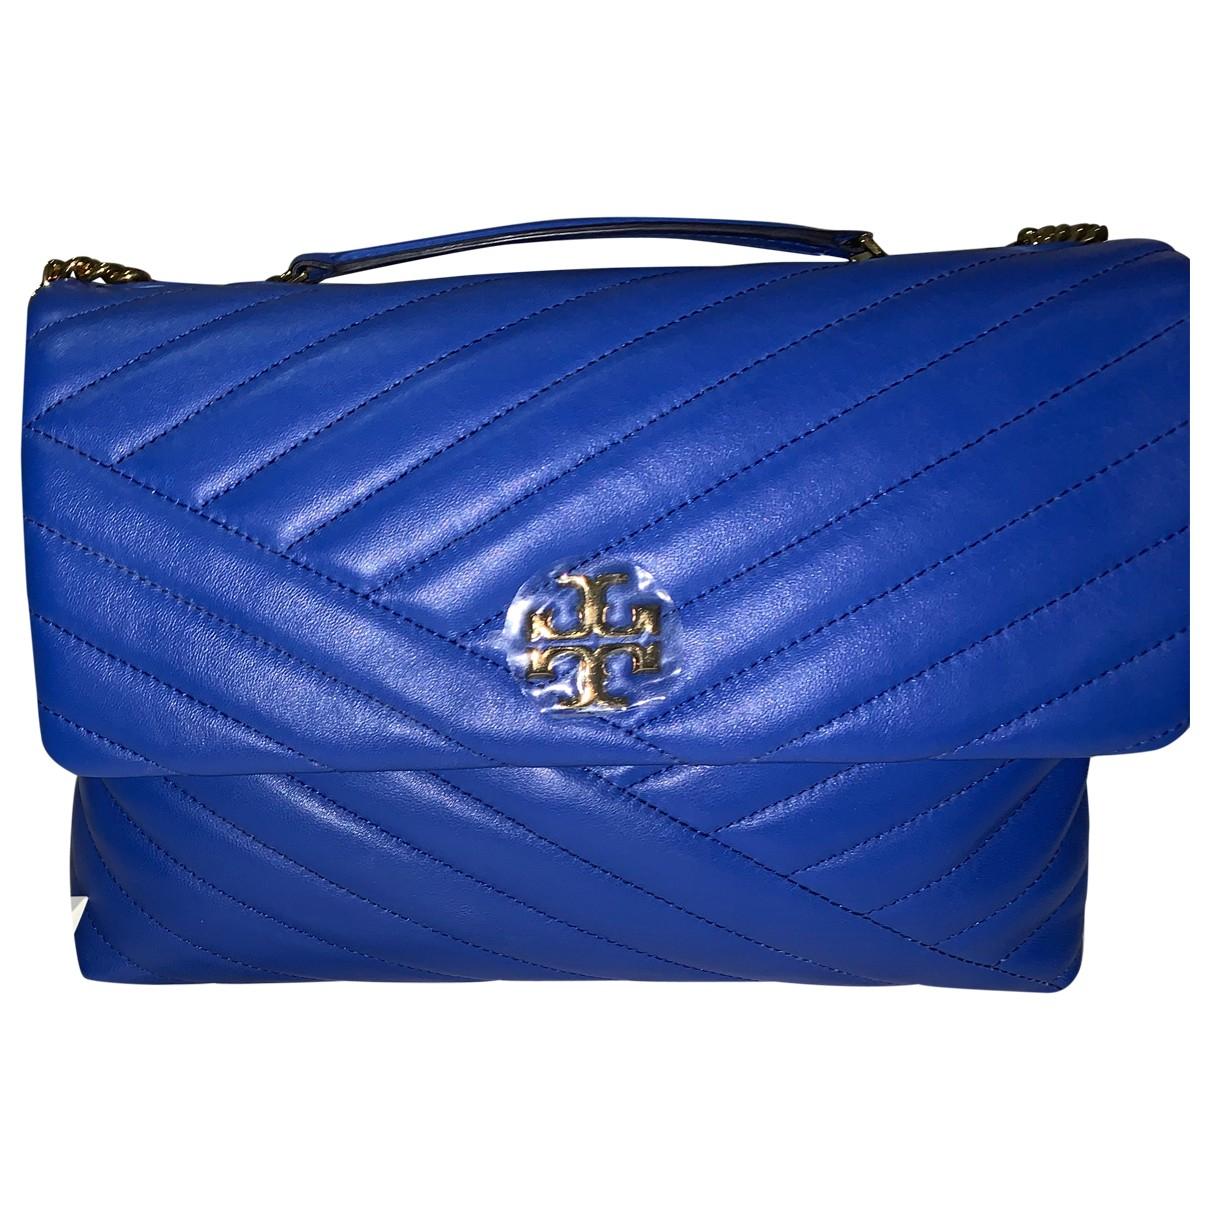 Tory Burch \N Blue Leather handbag for Women \N